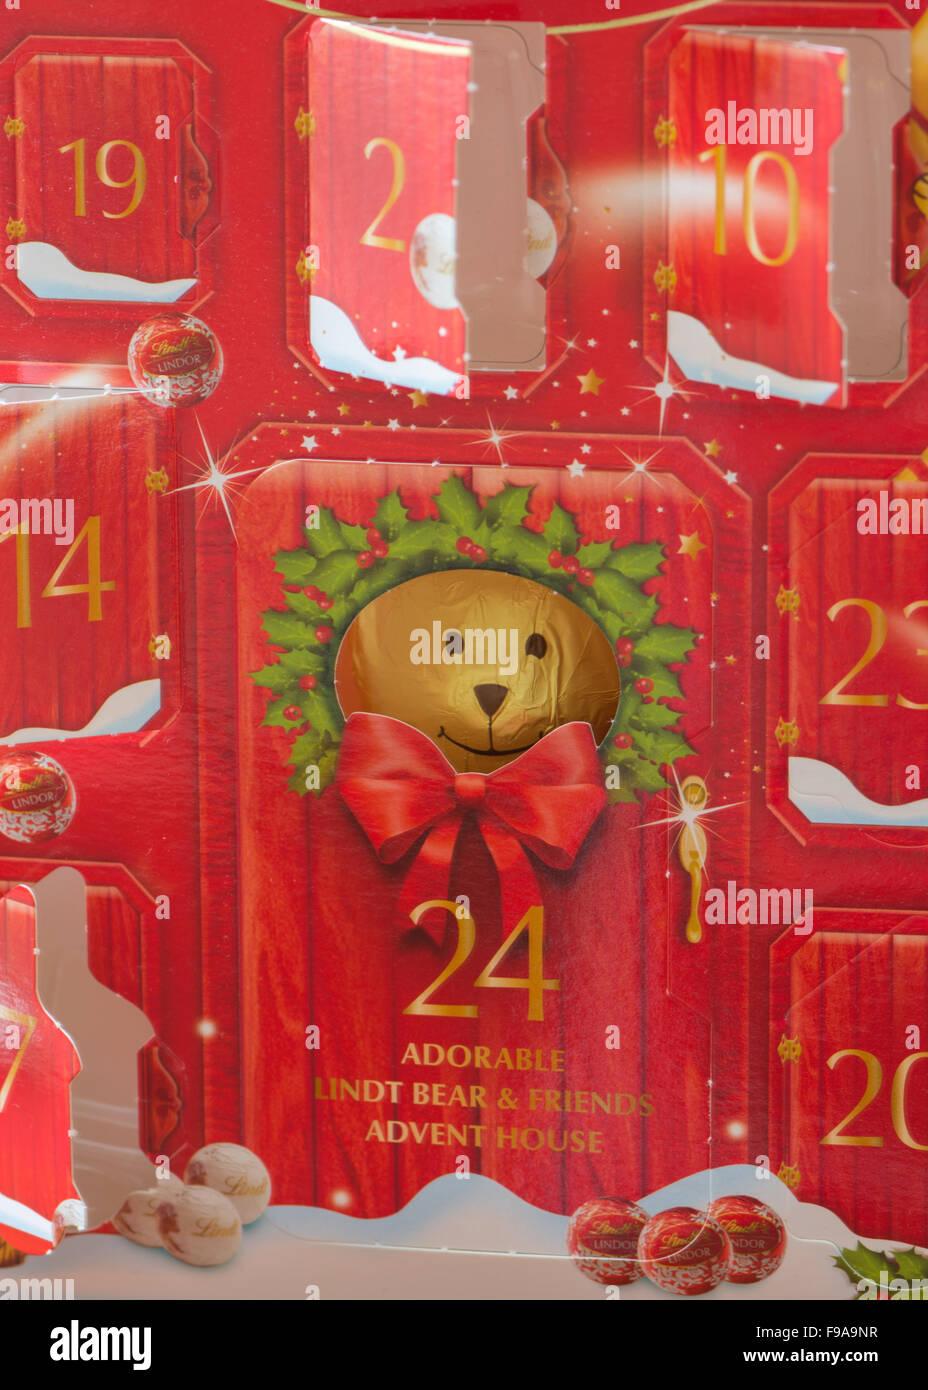 Advent Calendar Chocolate Stock Photos & Advent Calendar Chocolate ...